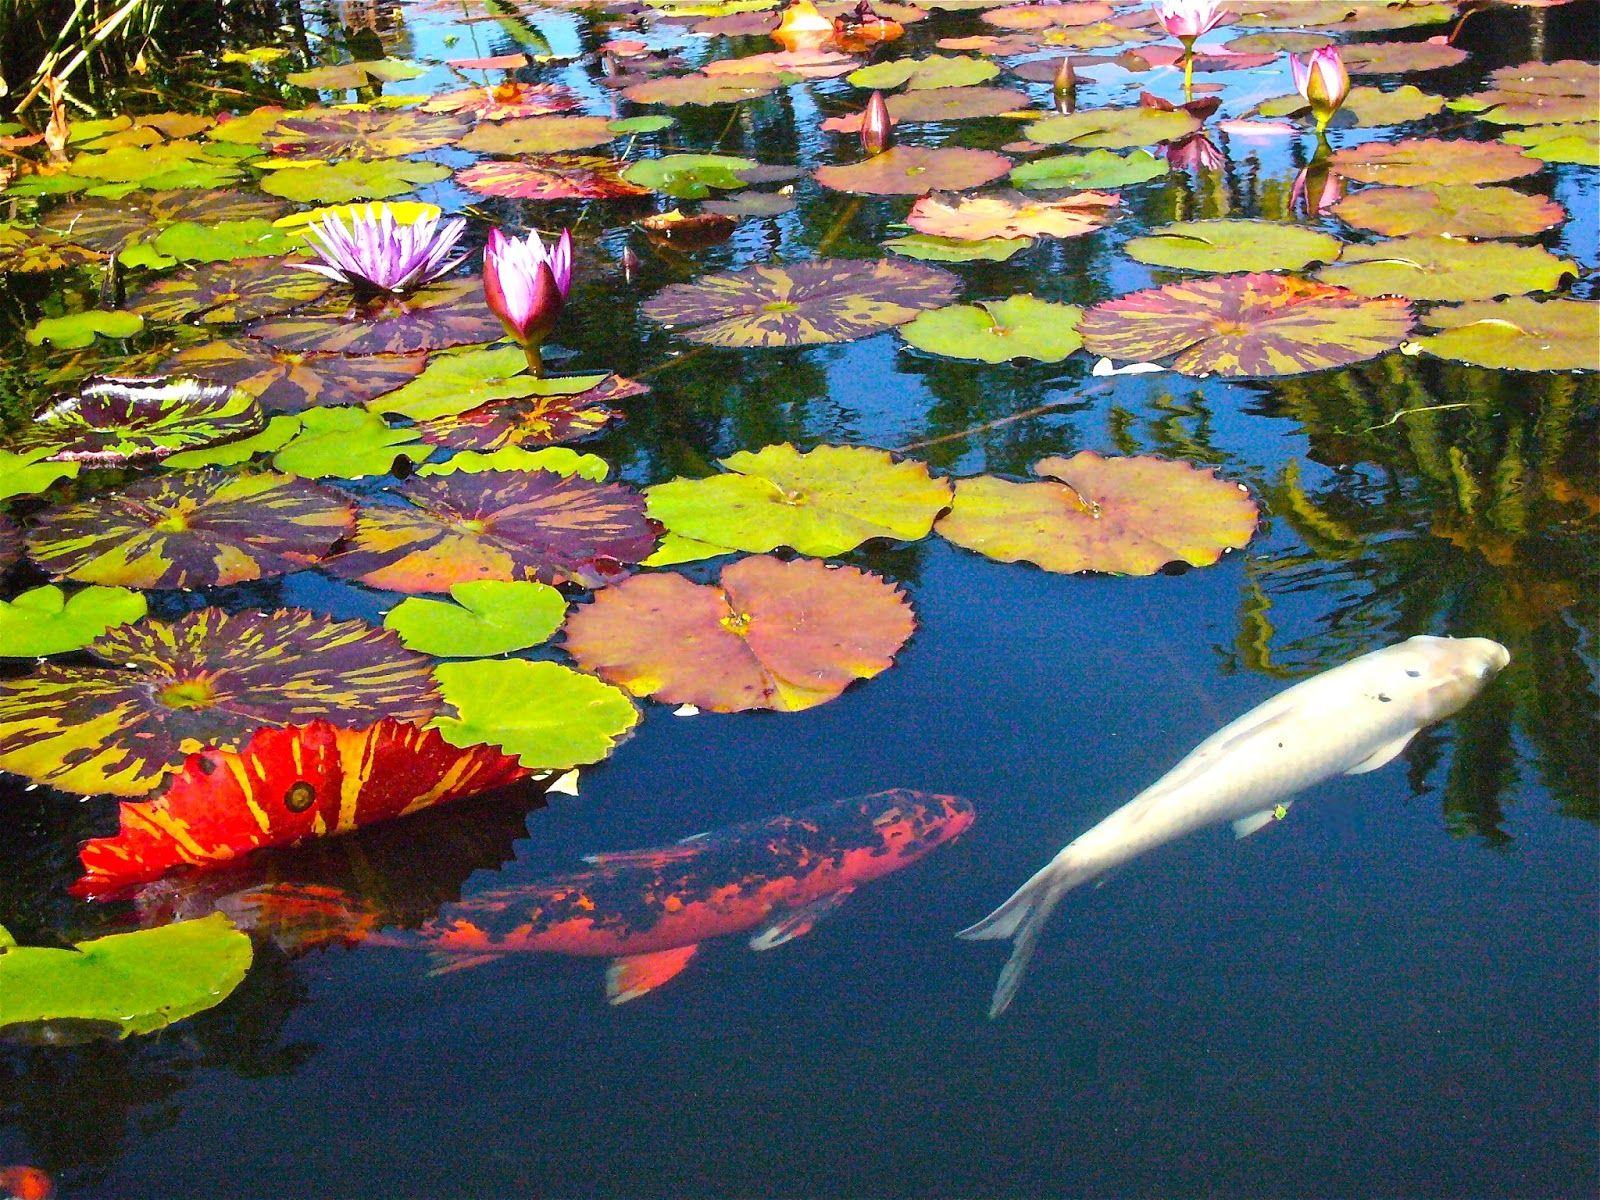 Most Beautiful Koi Fish Images Of Japanese Koi Koi Fish Japanese Koi